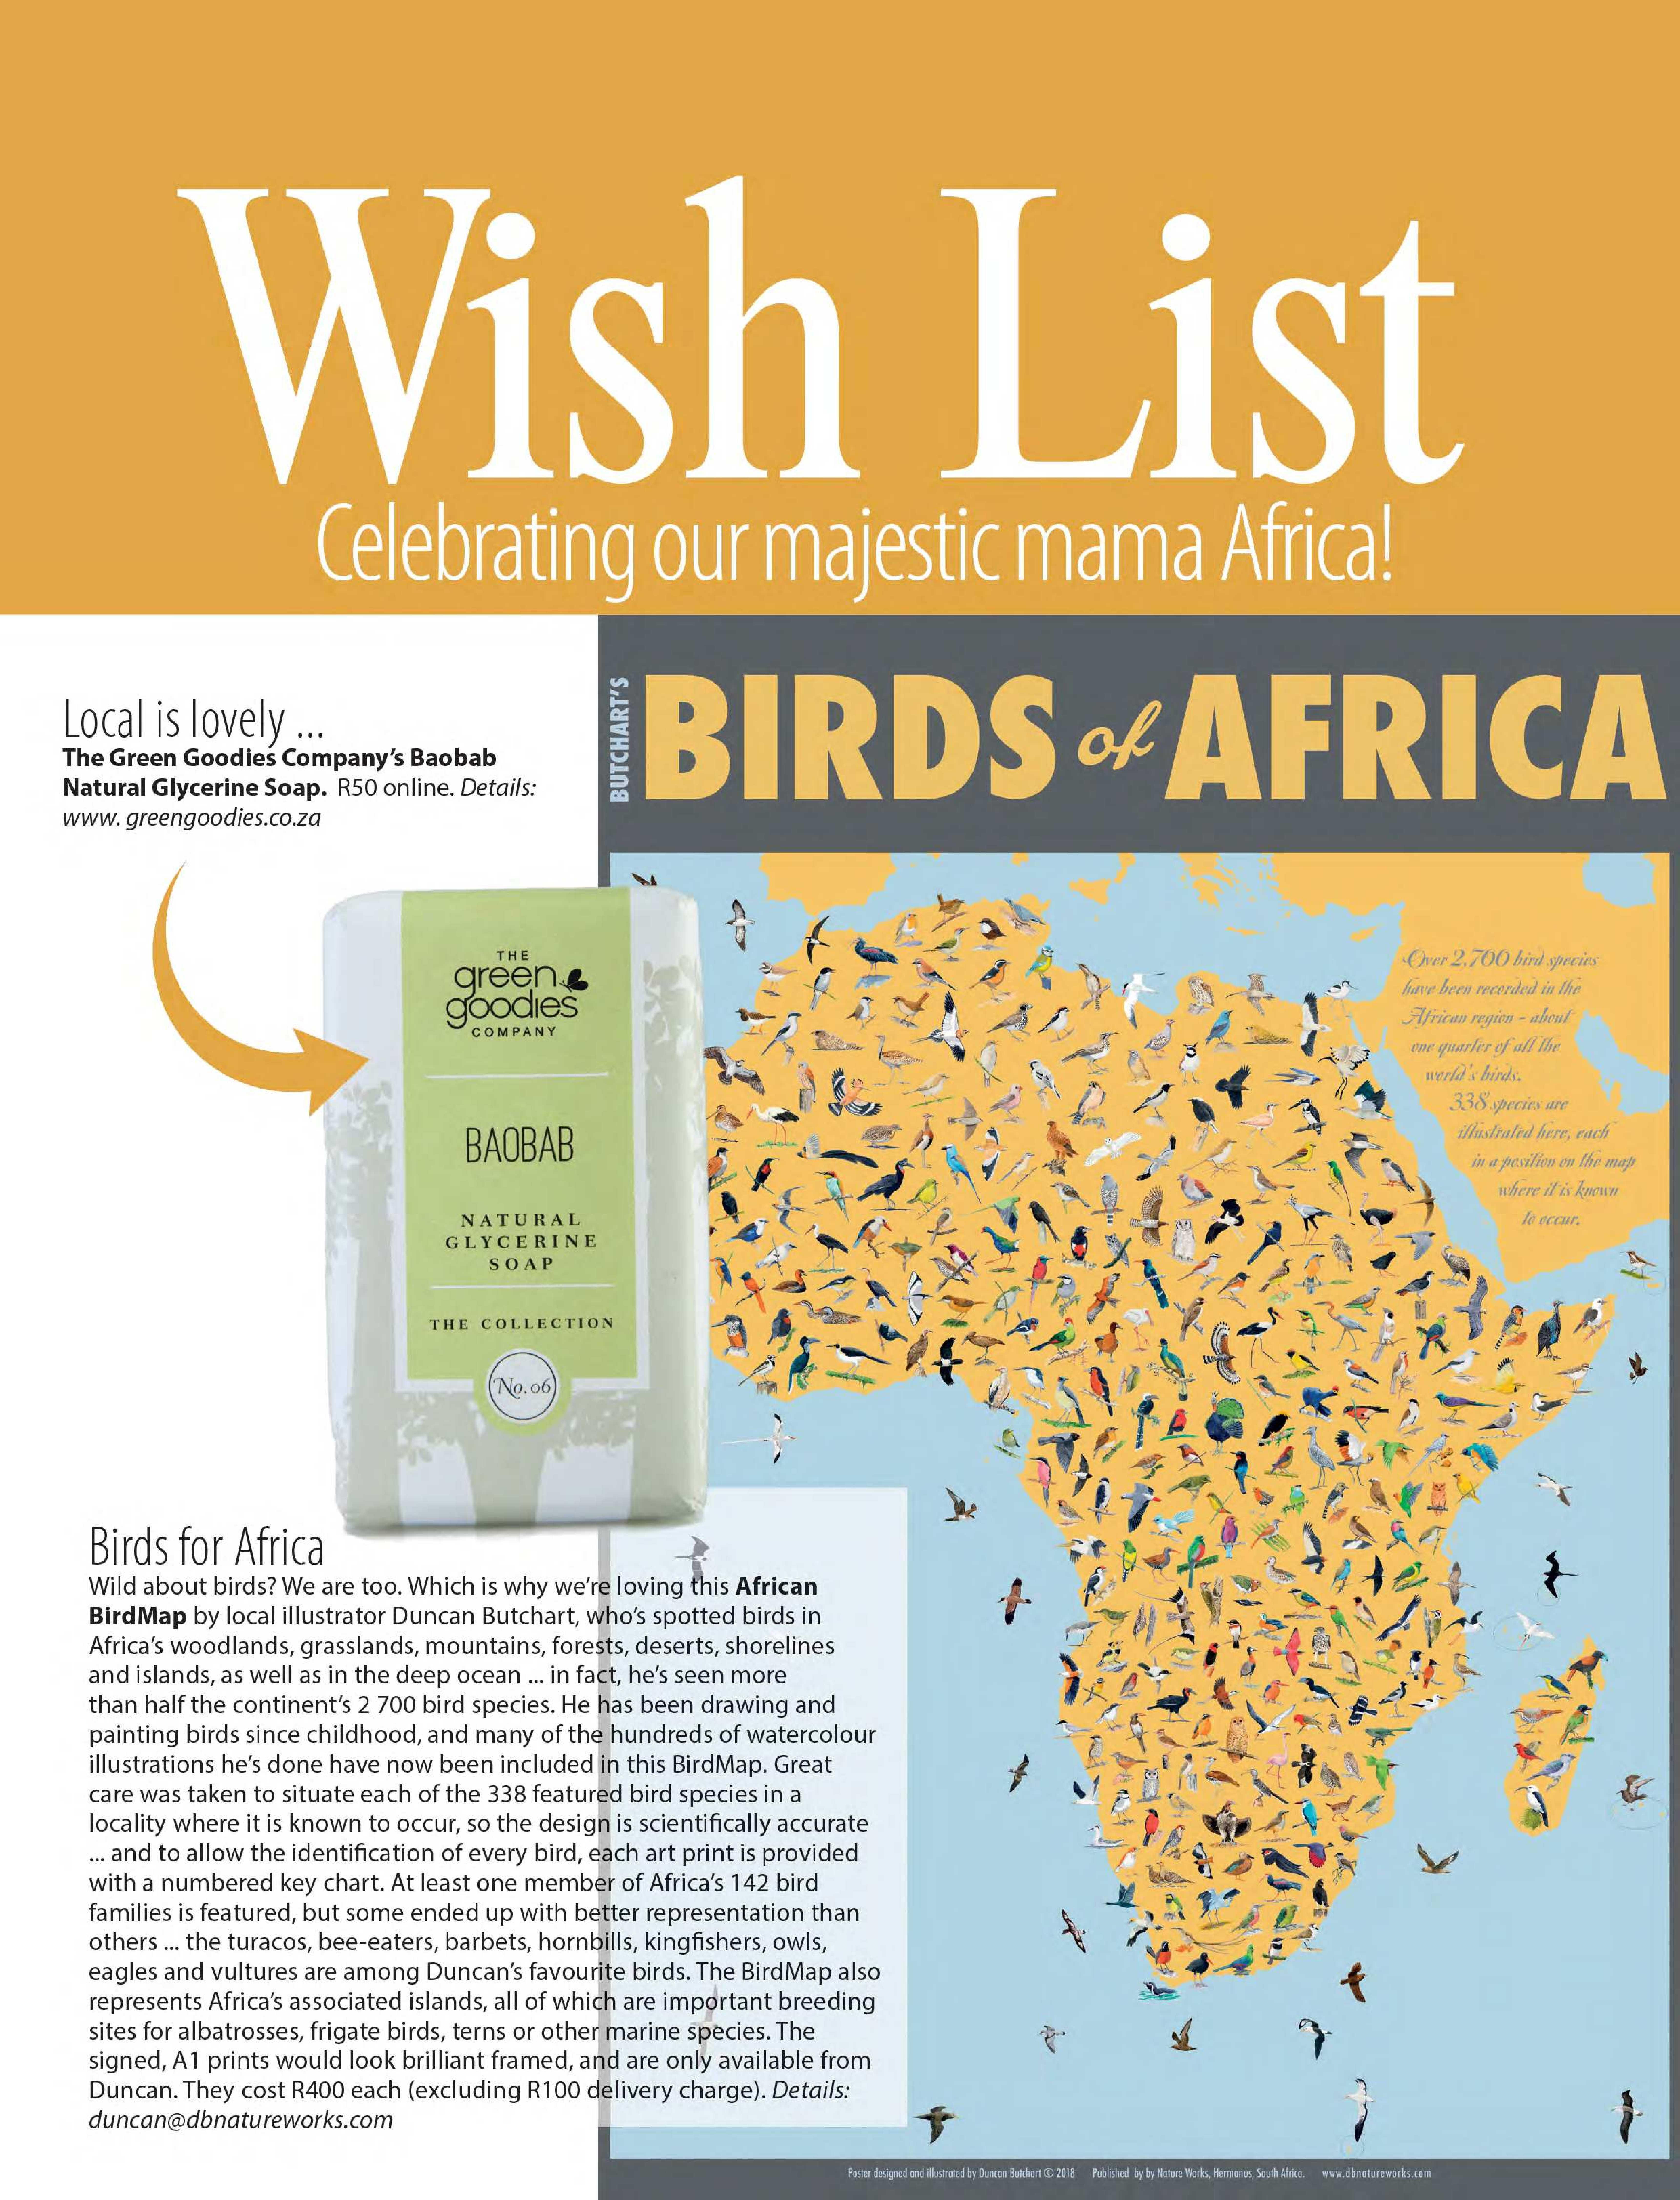 get-magazine-ballitoumhlanga-july-2018-epapers-page-10